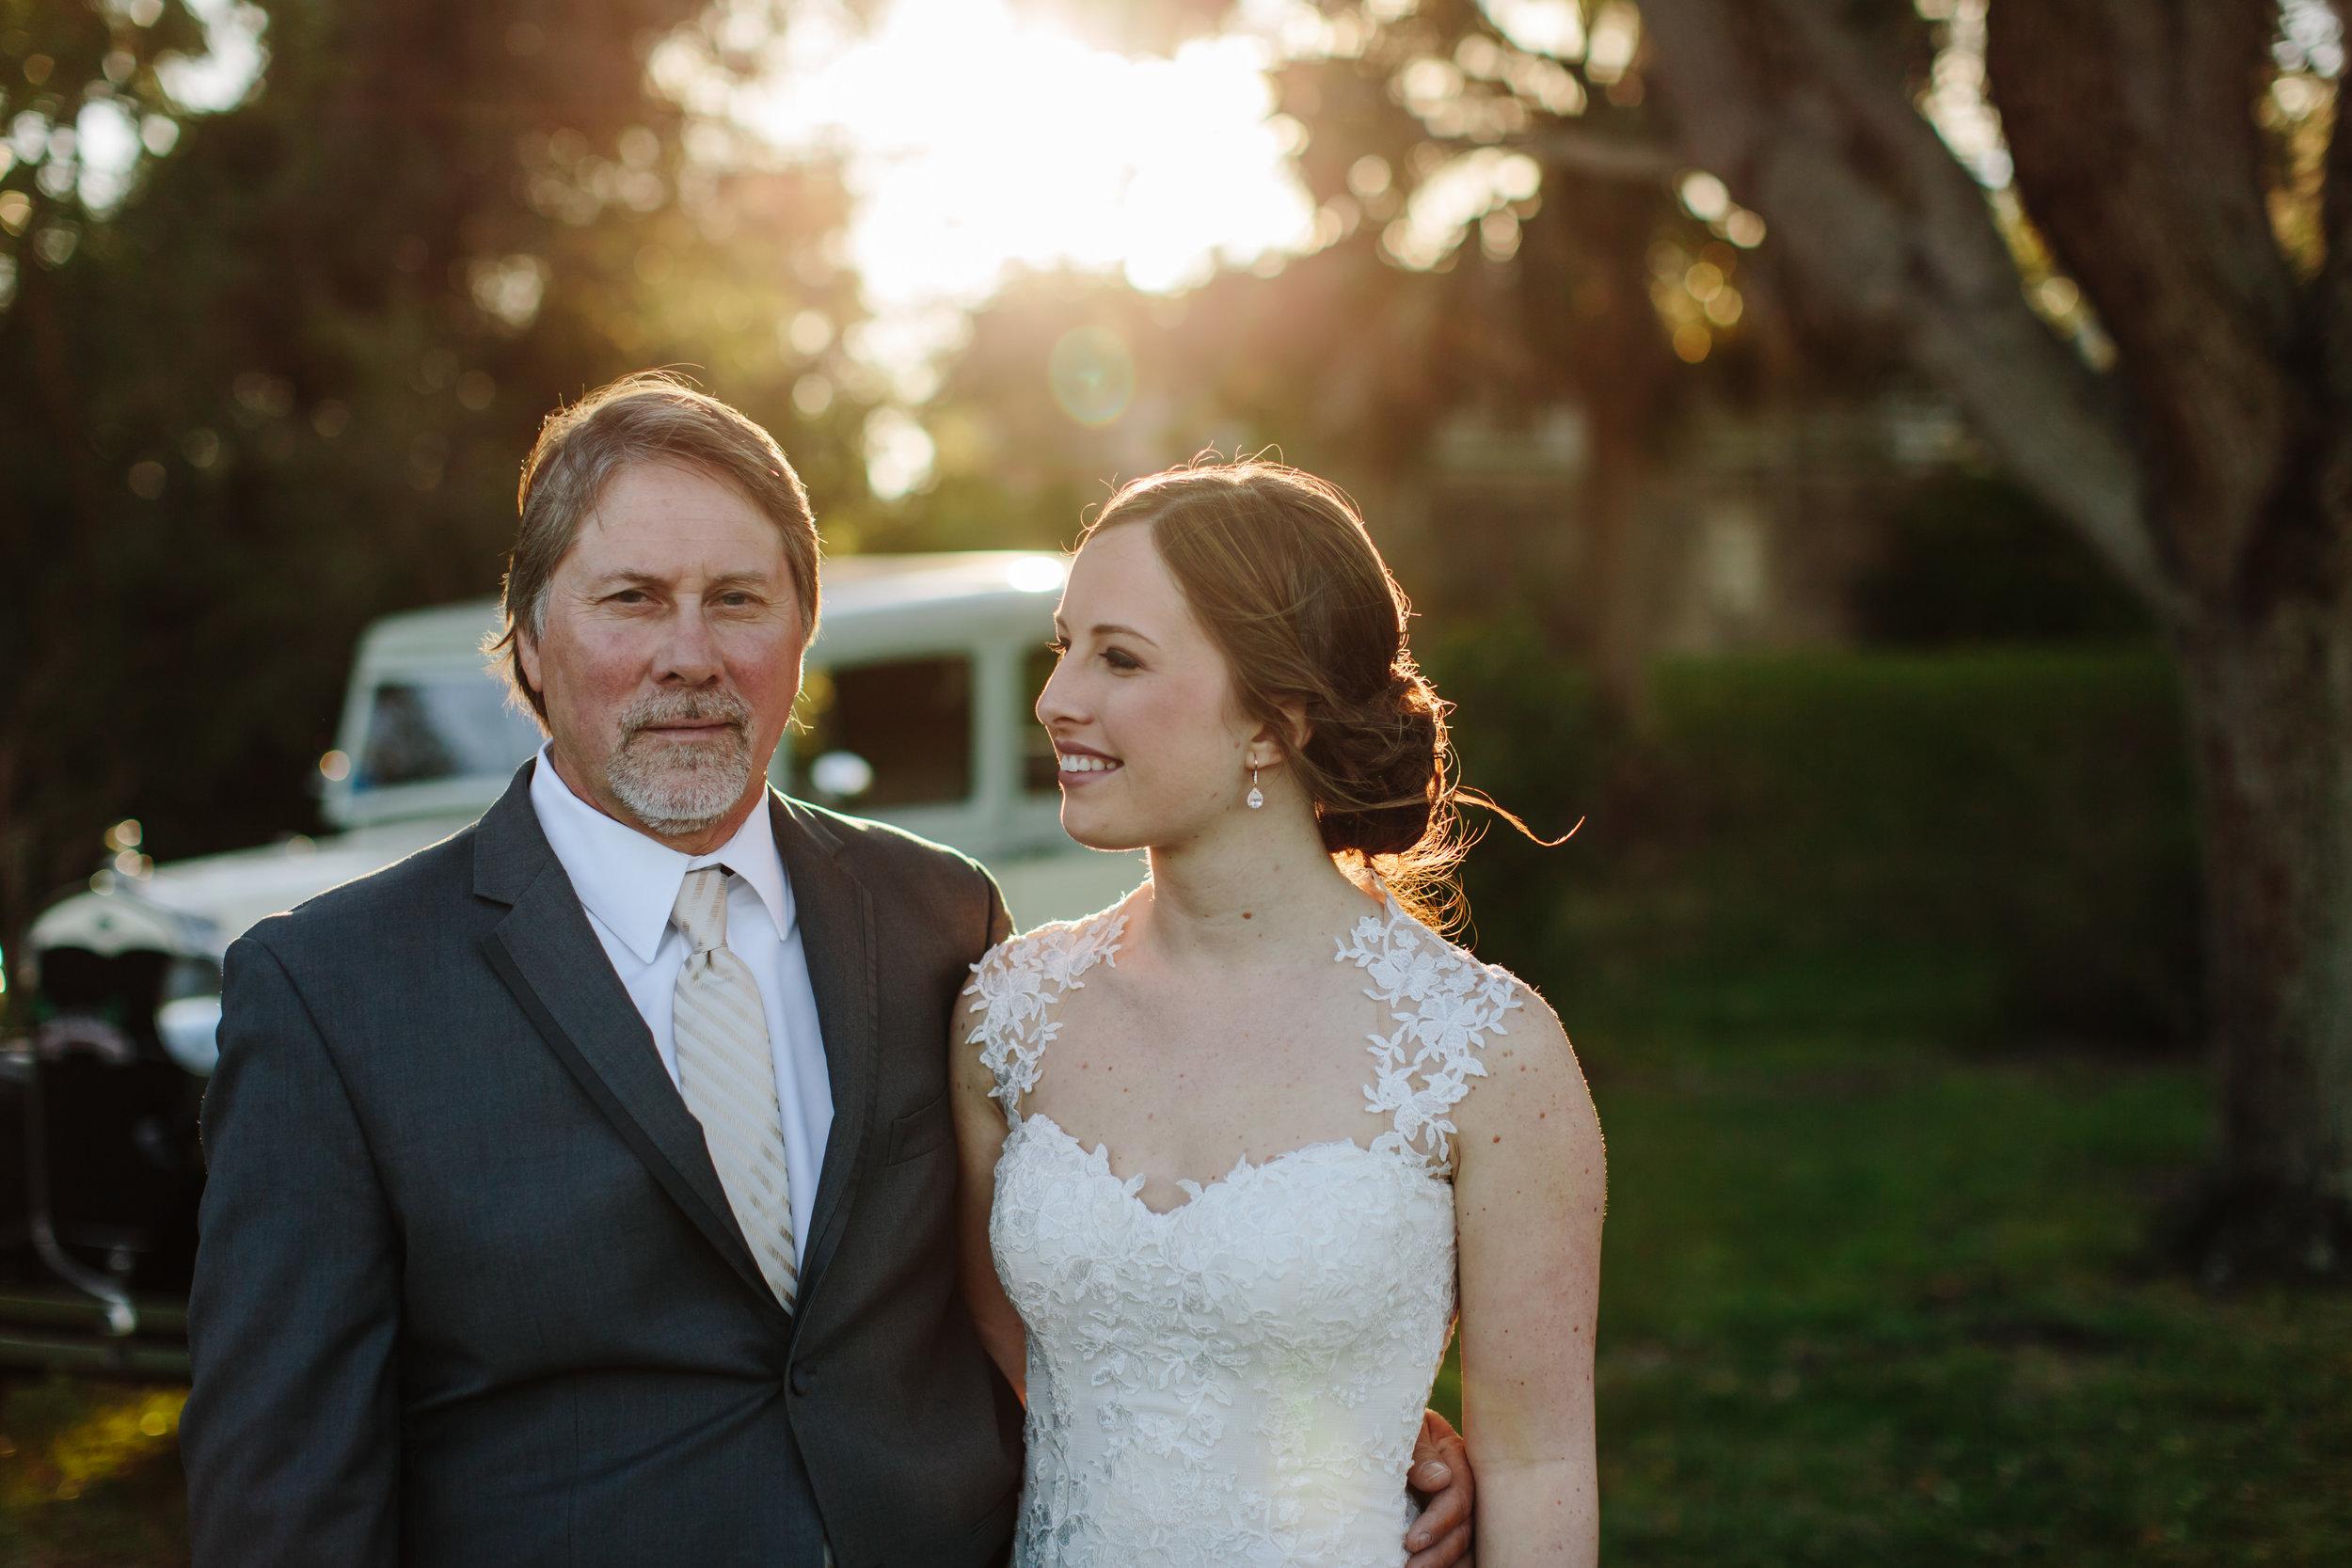 2018.02.17 Whitney and Joe Meyer Melbourne Wedding (504 of 759).jpg